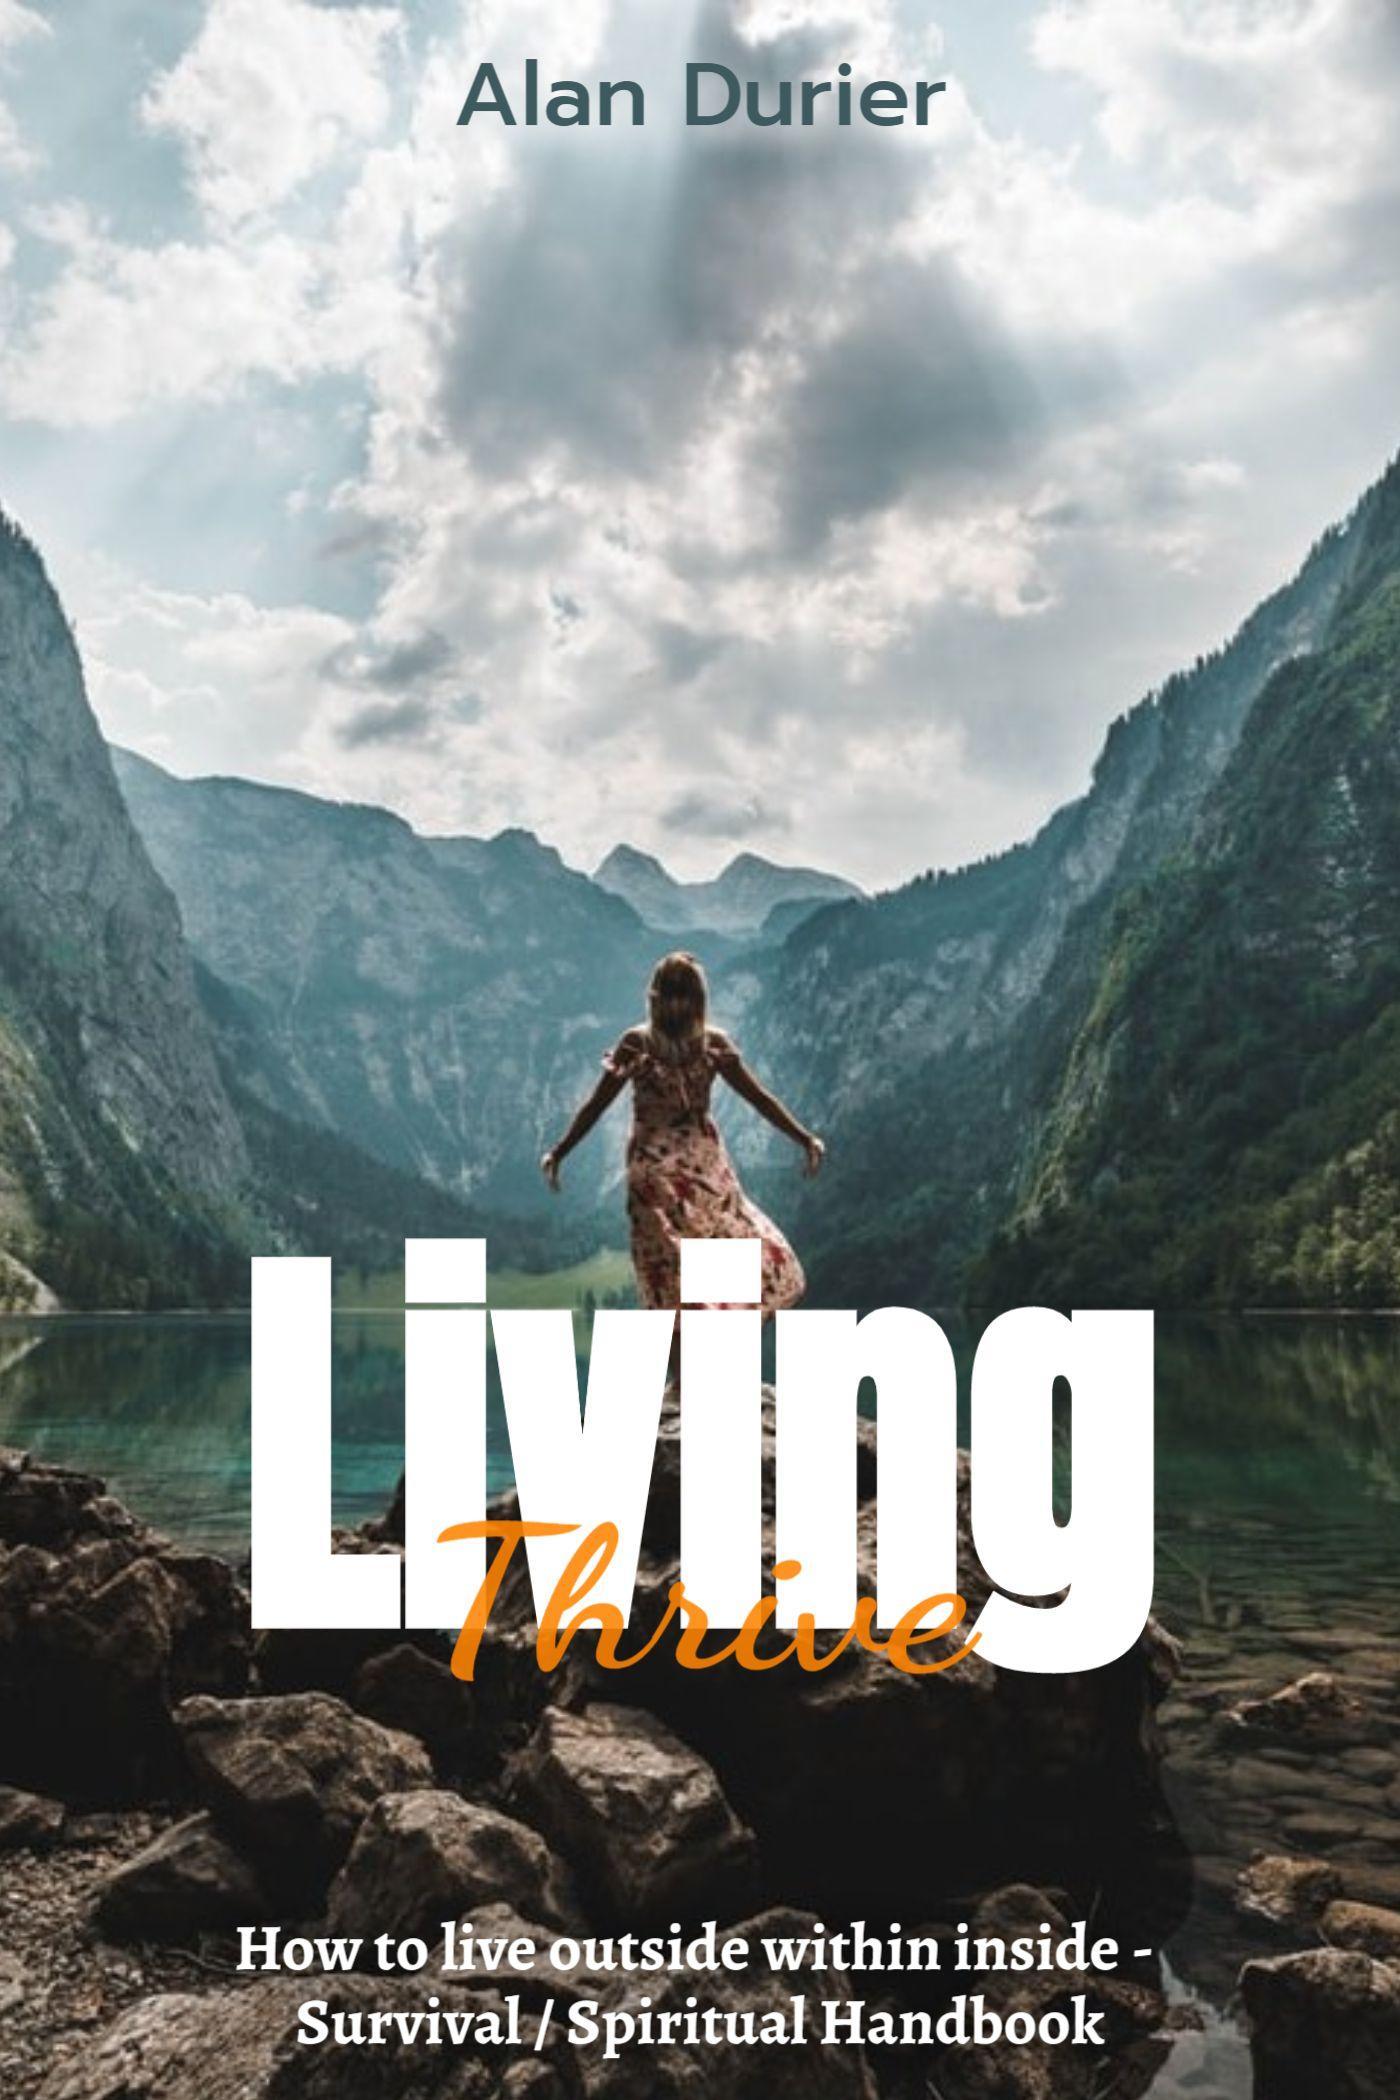 Spiritual Survival Handbook Design